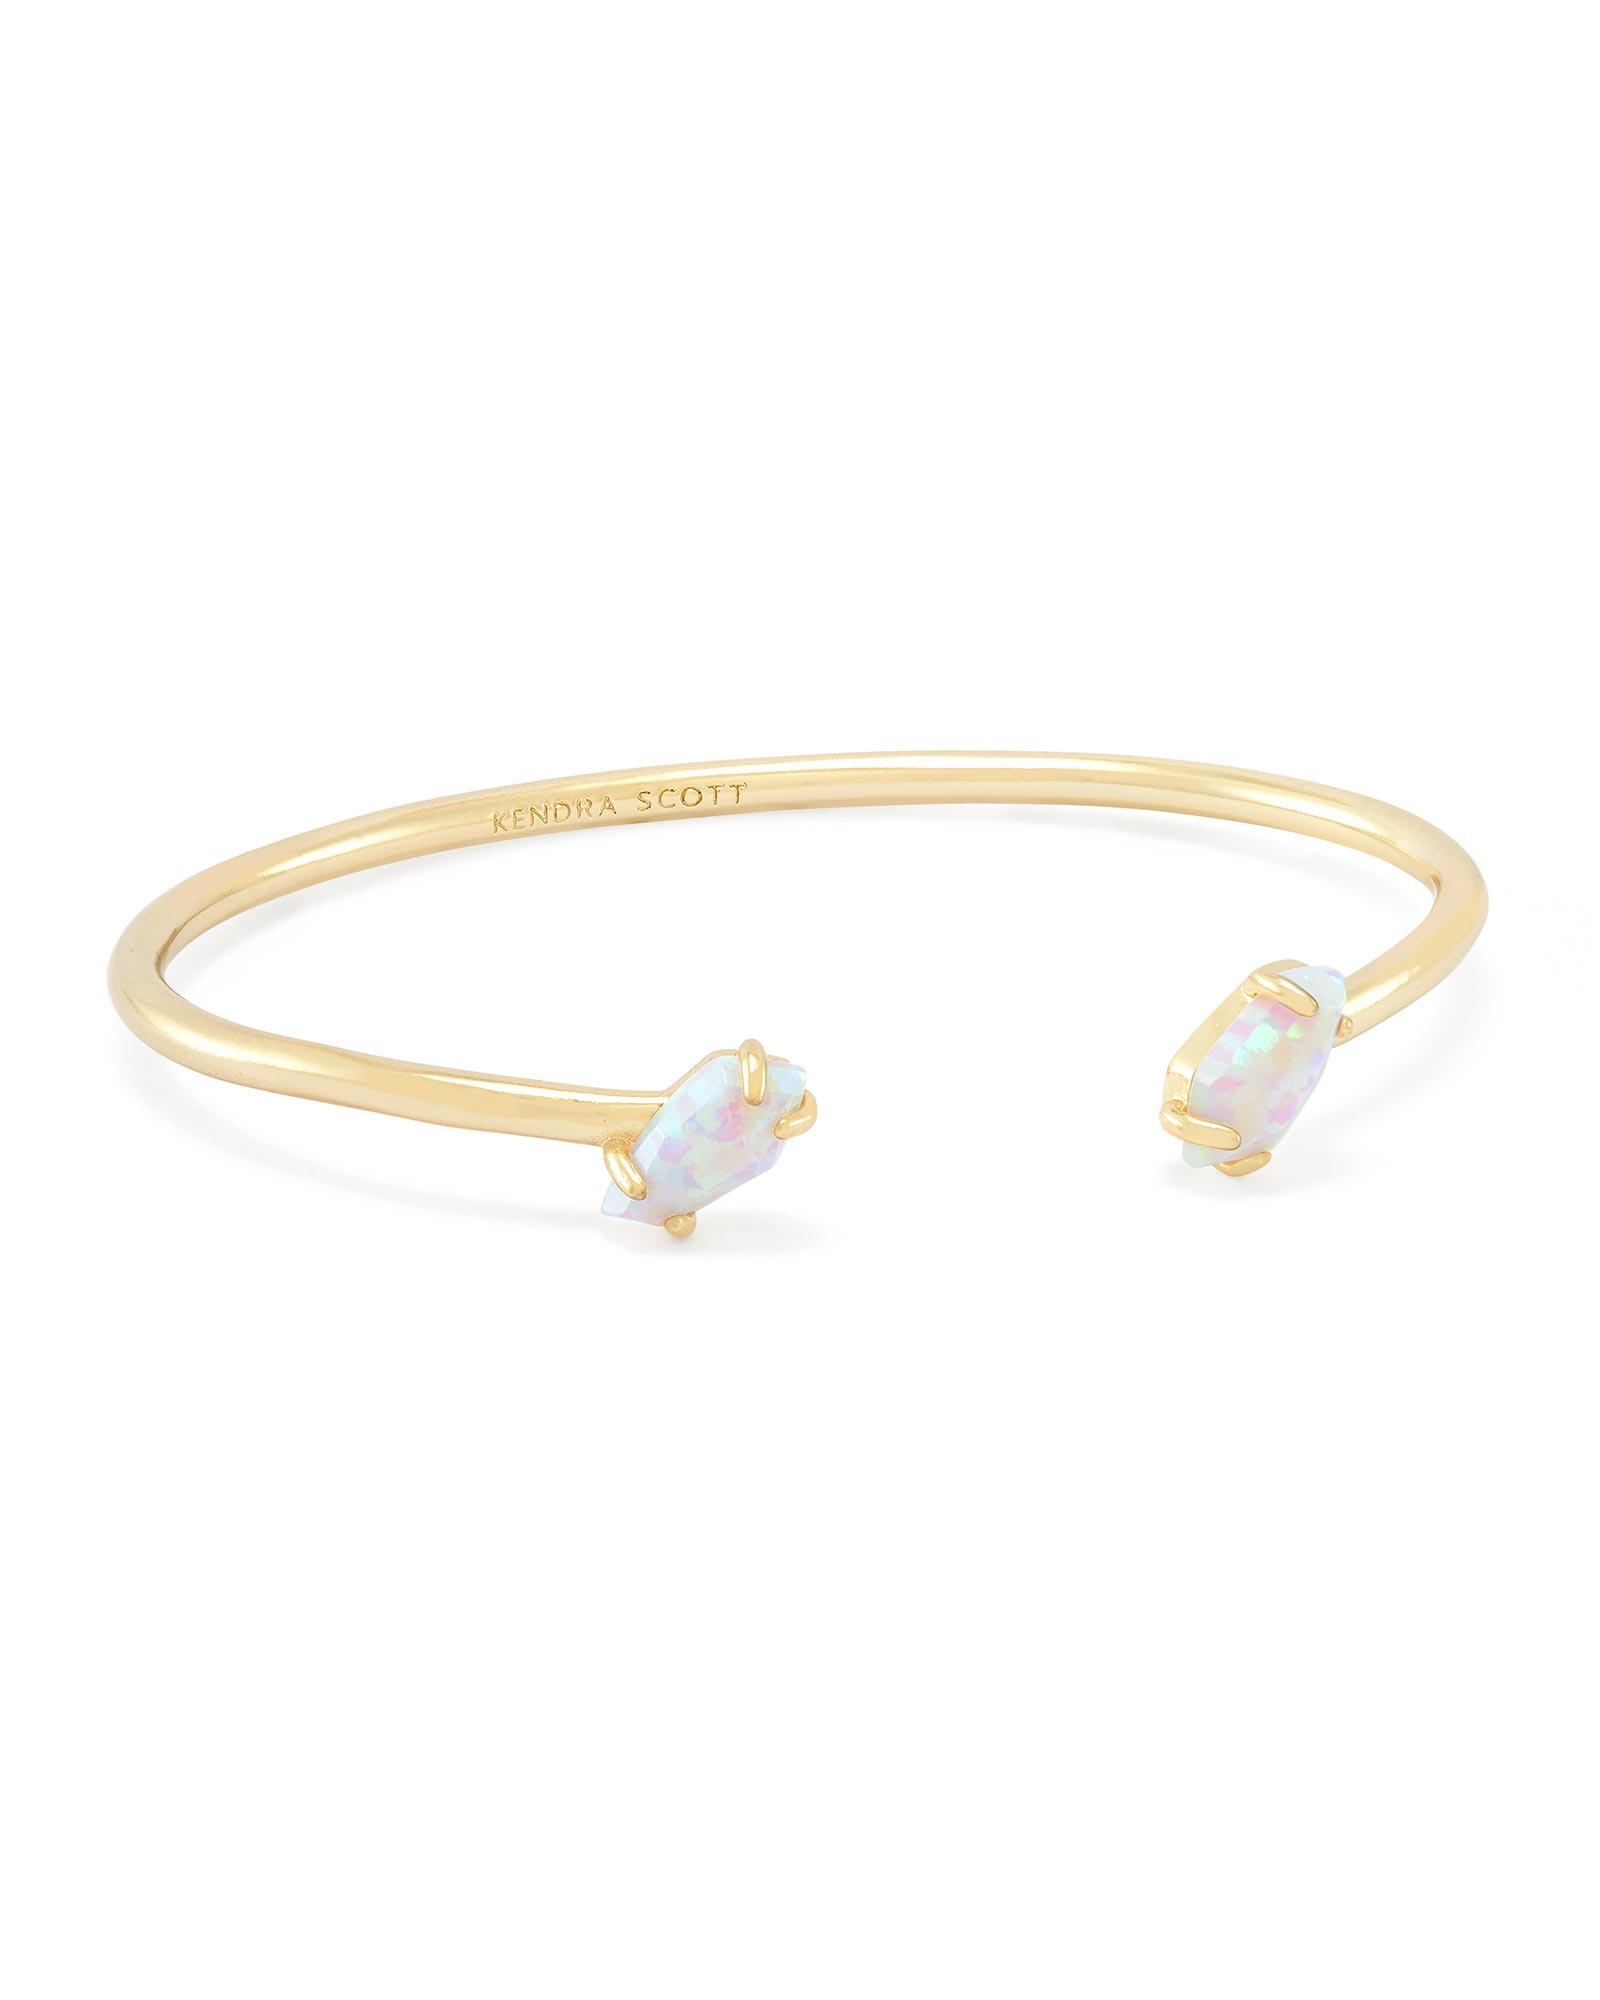 Jackson Pinch Bracelet In White Kyocera Opal